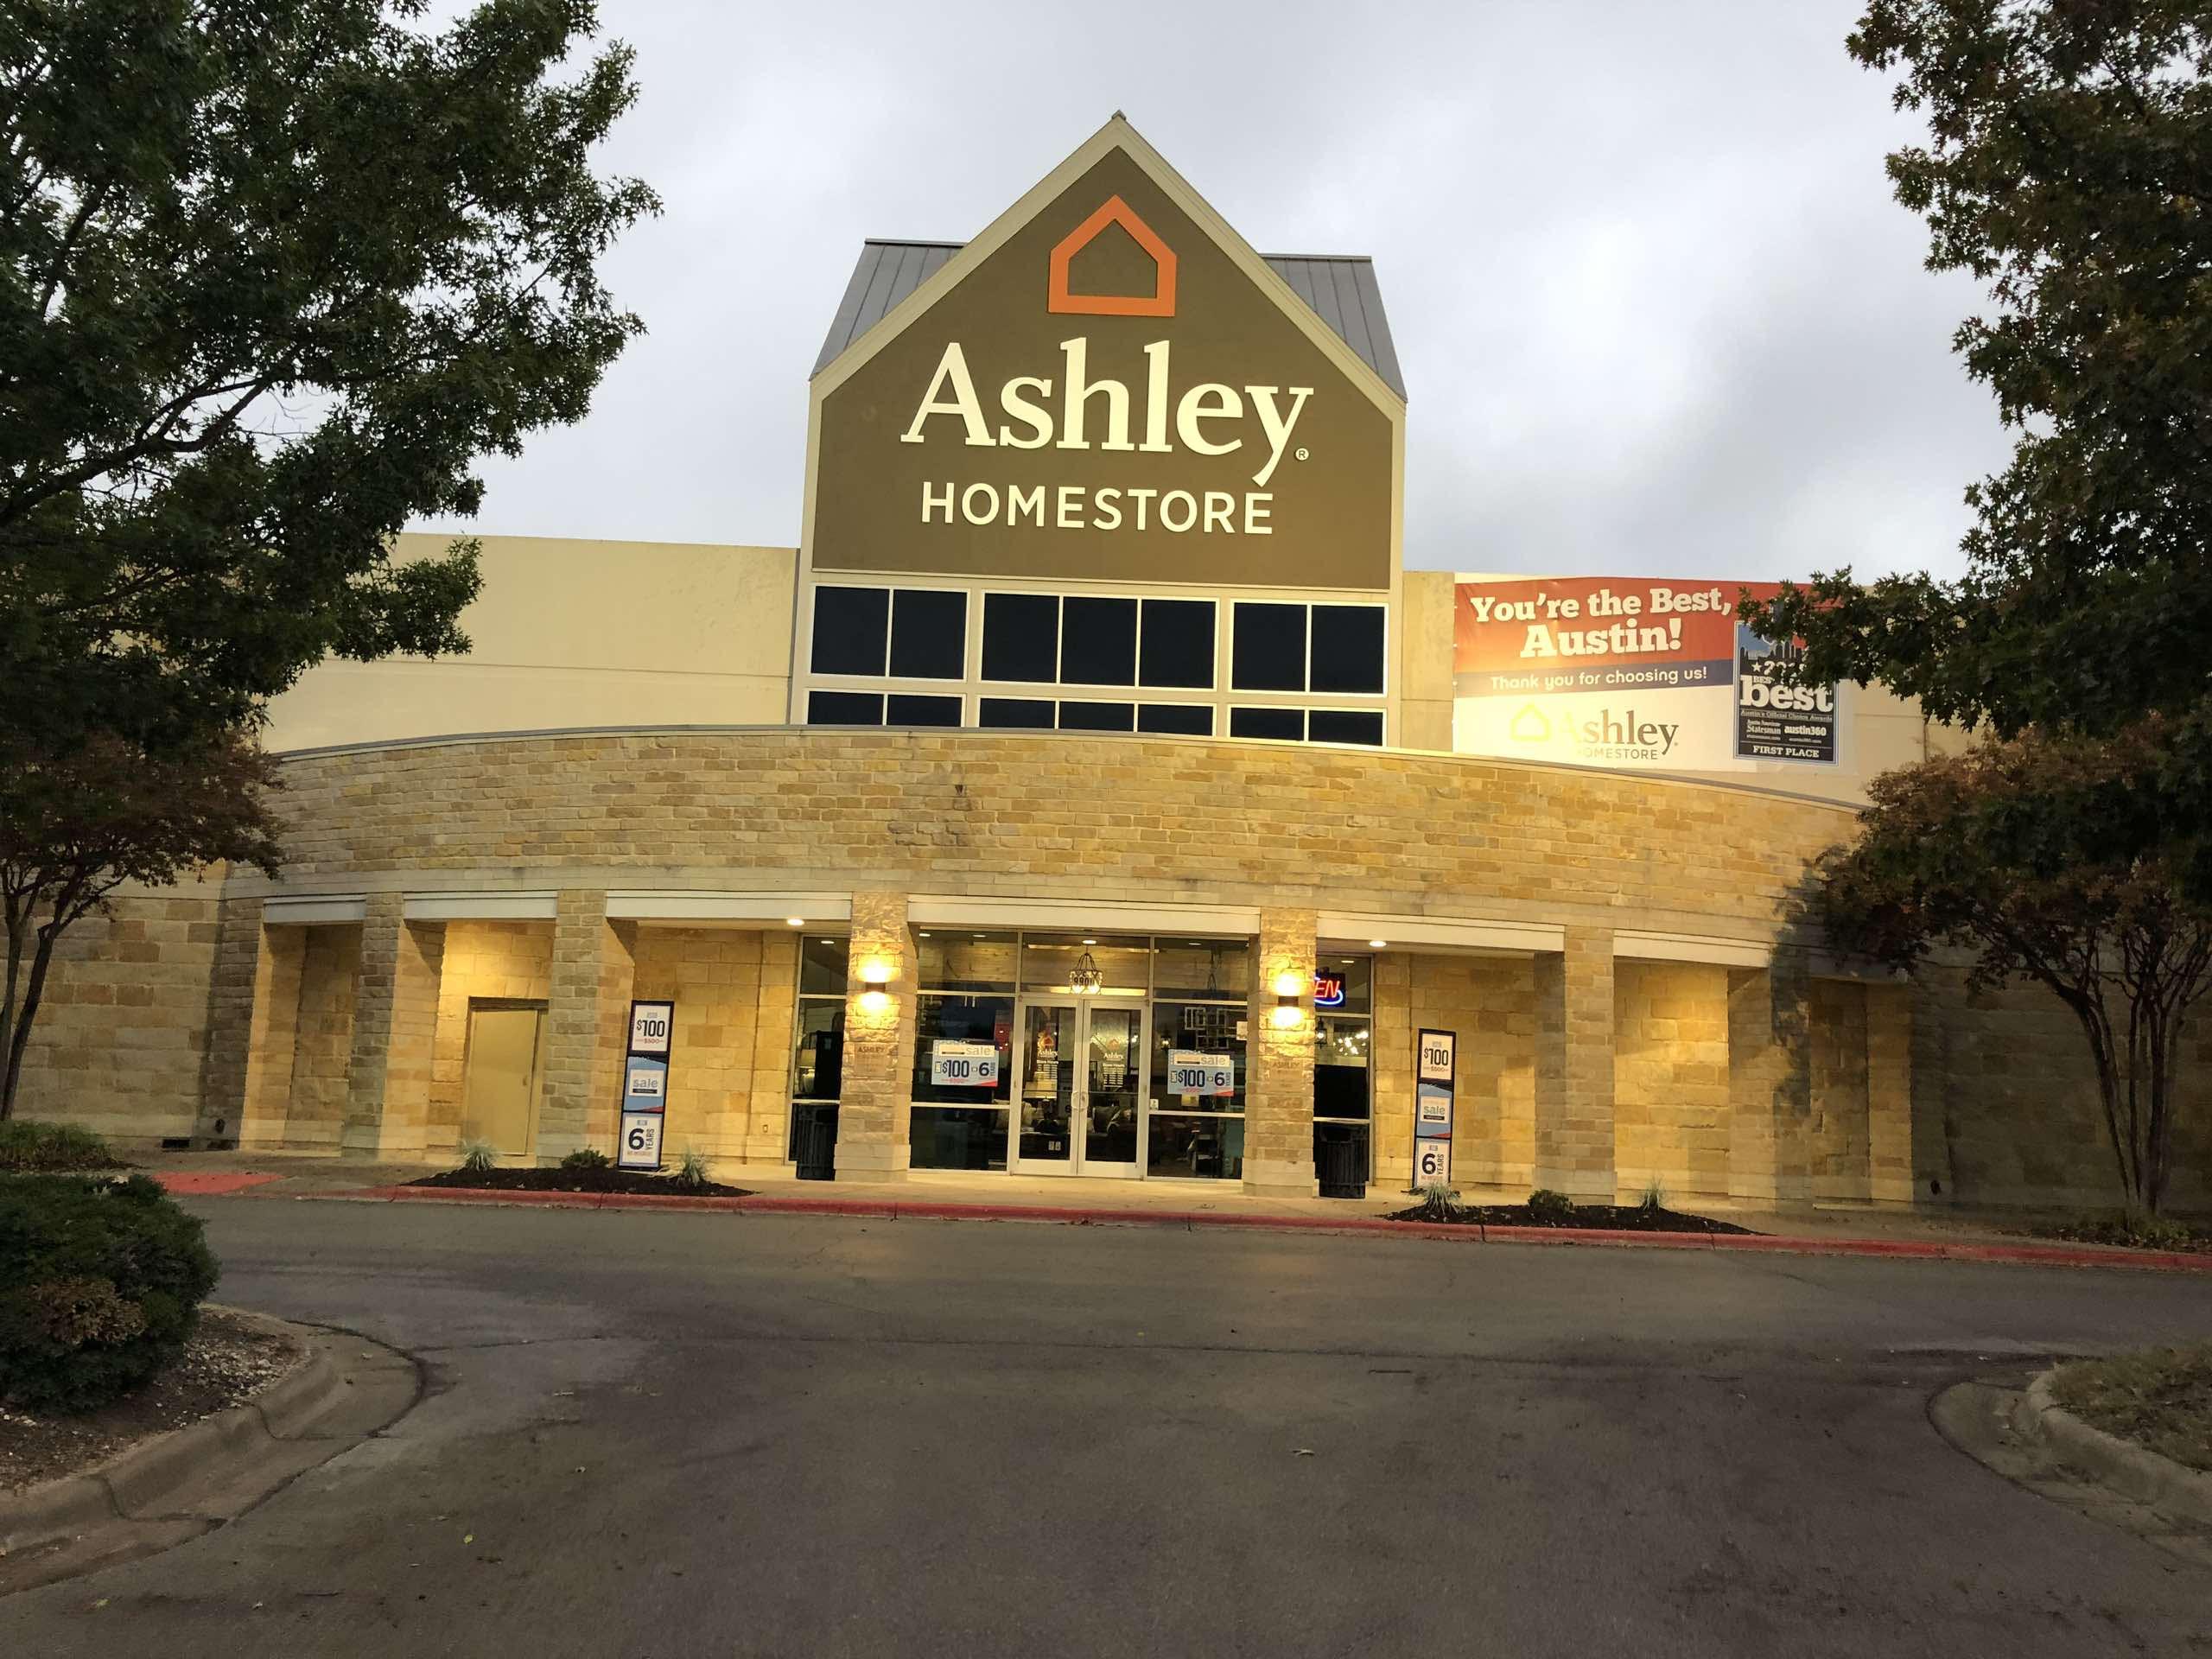 Furniture And Mattress Store At 9900 S Ih 35 Building C Austin Tx Ashley Homestore